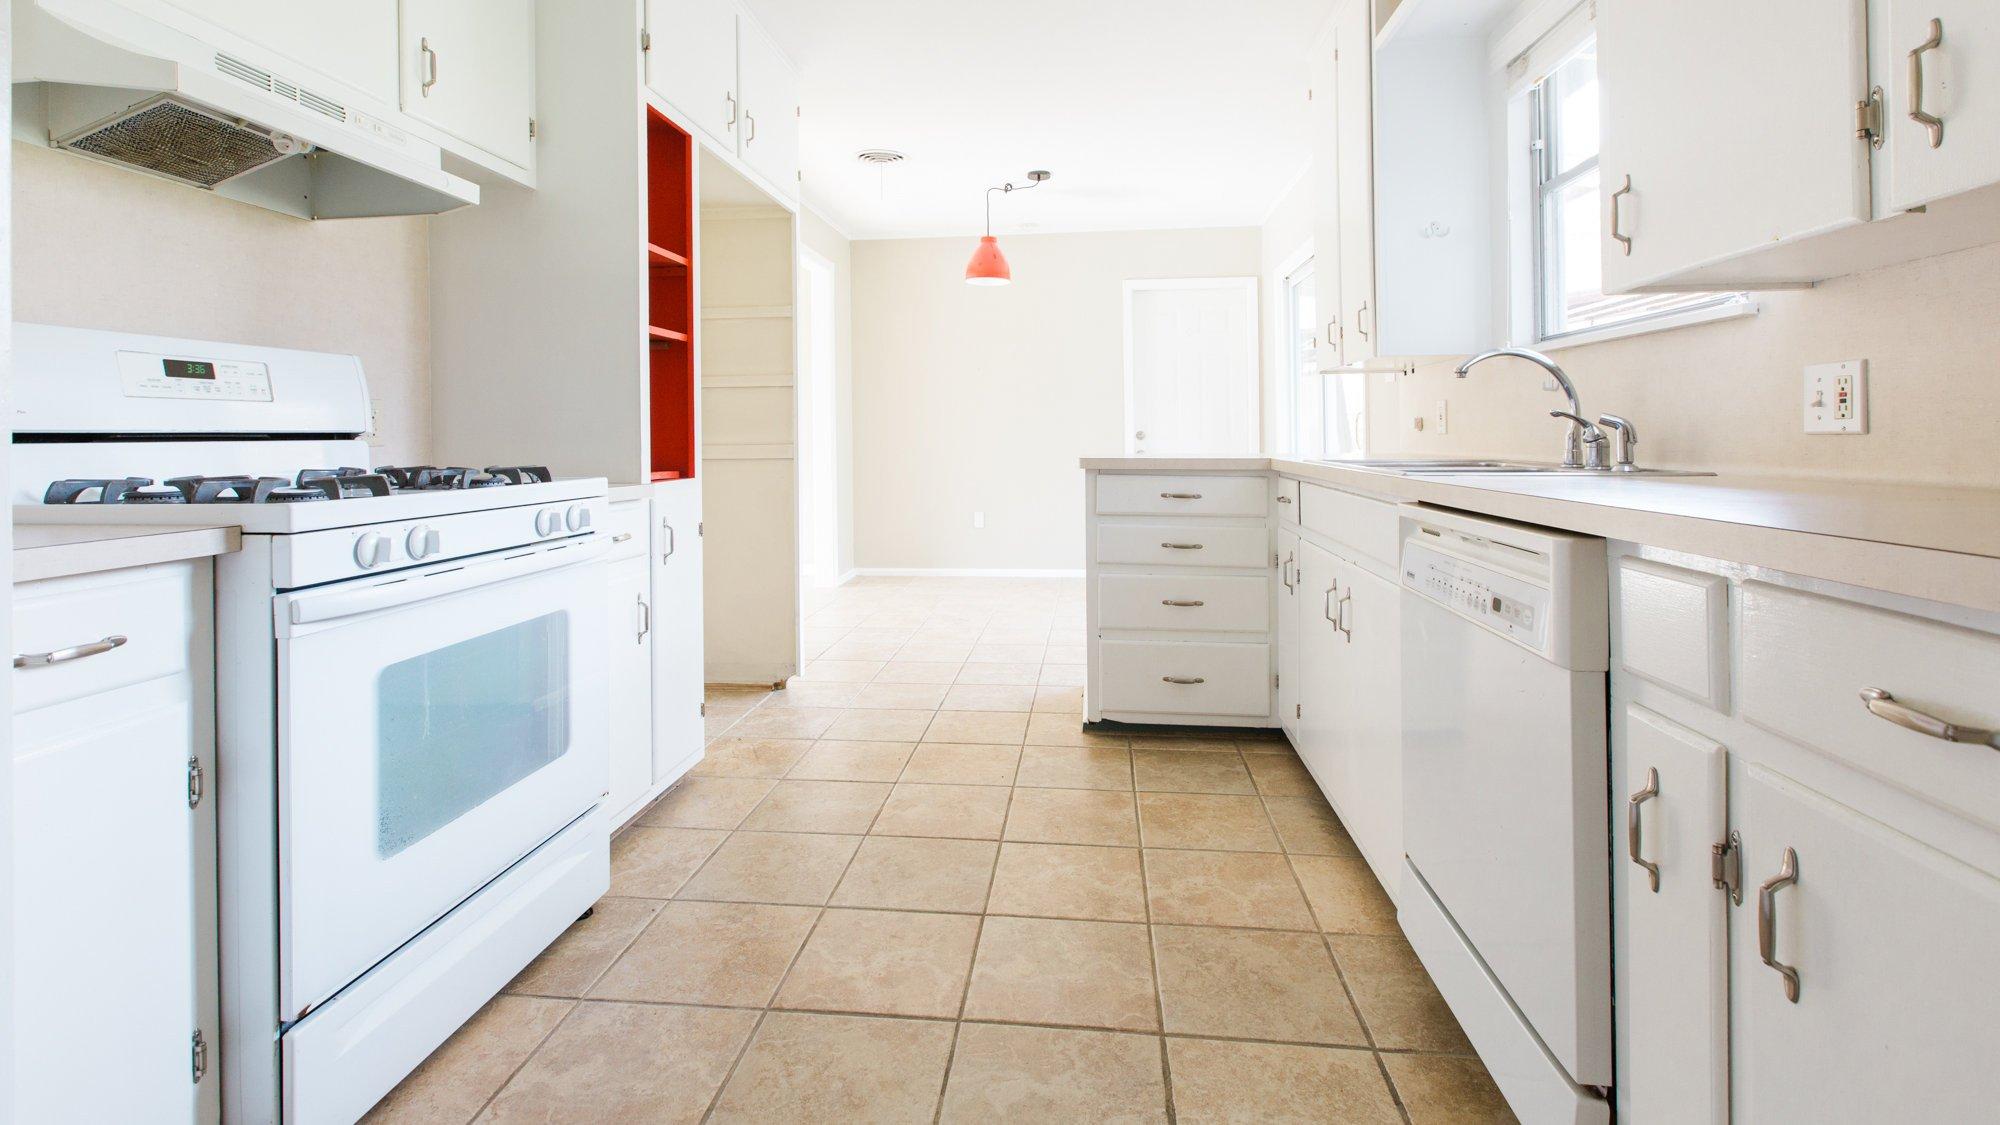 Love_Ding_Blog_Home_Renovation_Ranch_Kitchen_Before_Diana_Ascarrunz_Photography.jpg